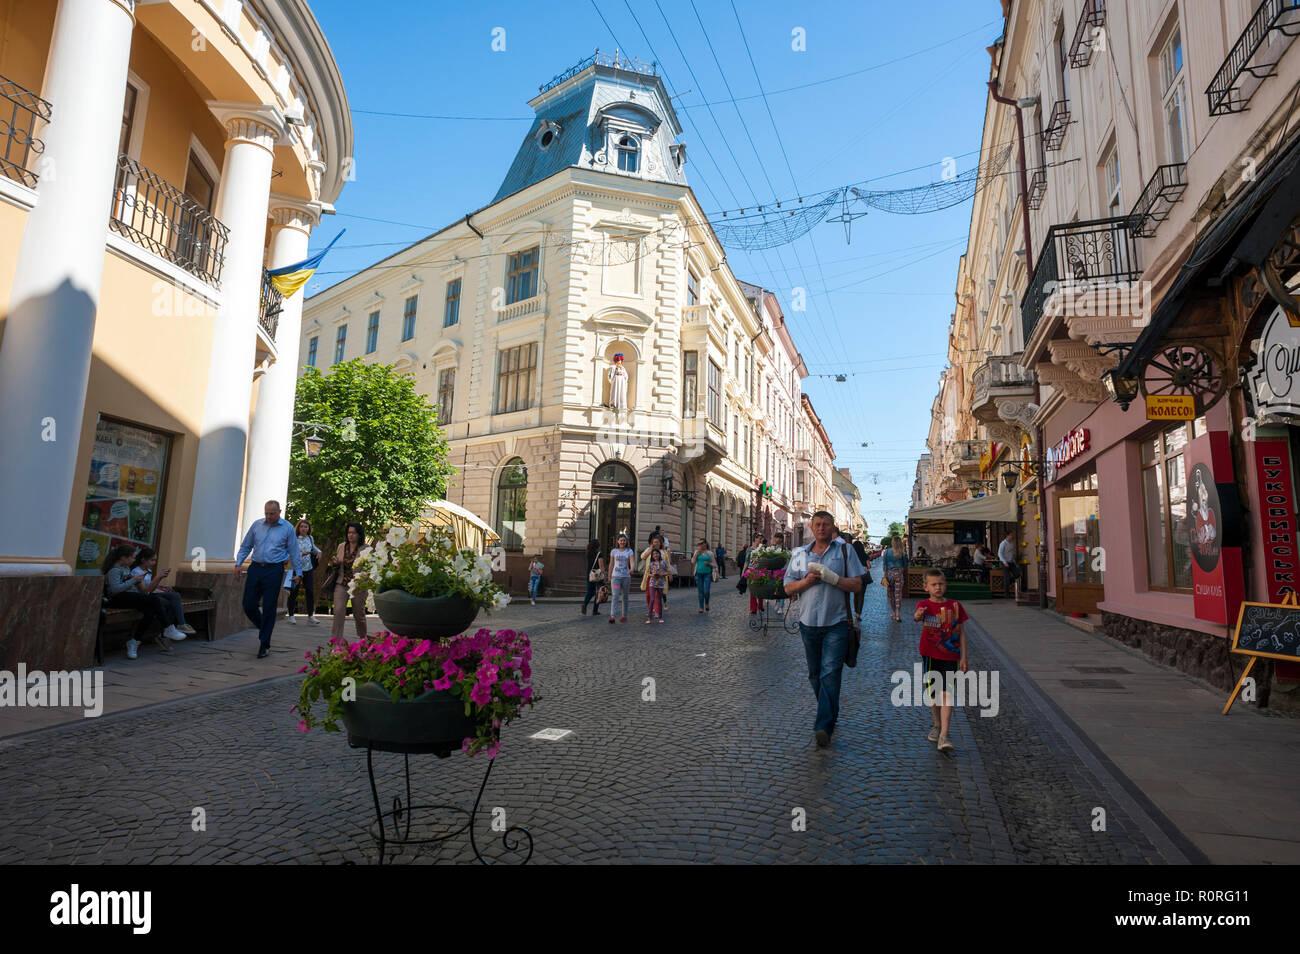 Pedestrians on Olha Kobylyahska Street in Chernivtsi, a superb example of Austro-Hungarian Empire architecture in western Ukraine. - Stock Image